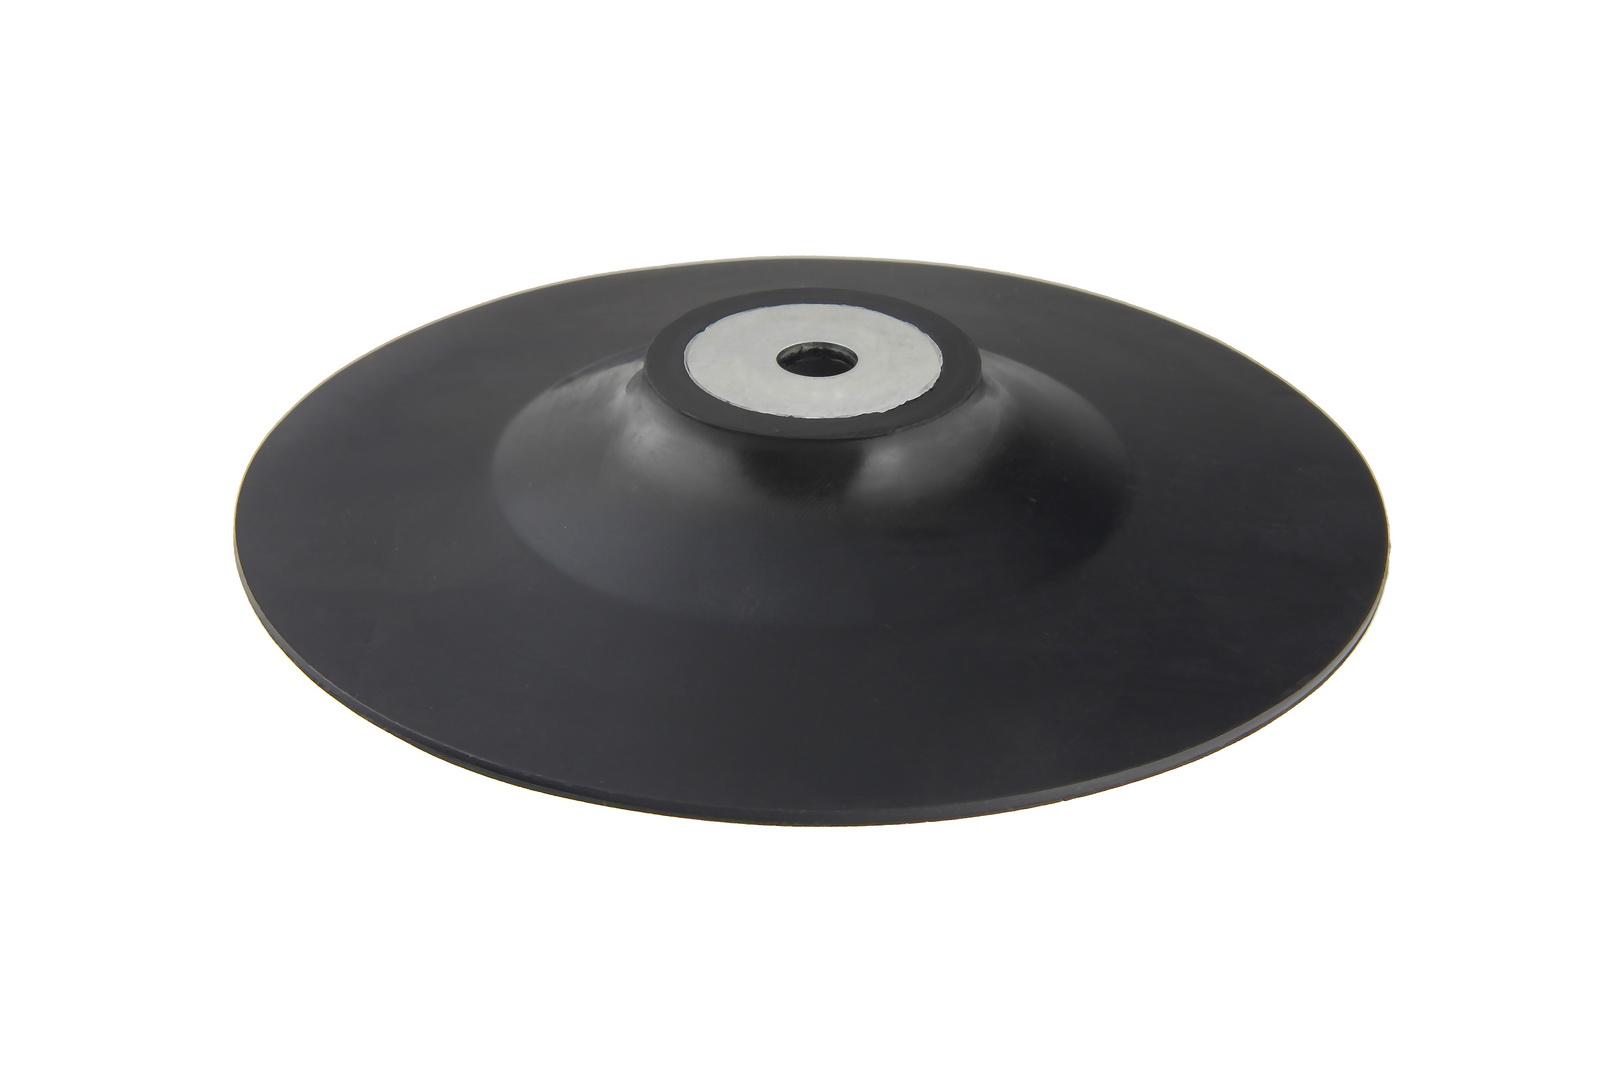 Купить Тарелка опорная Hammer 227-003 pd pd d6 rb 125 мм